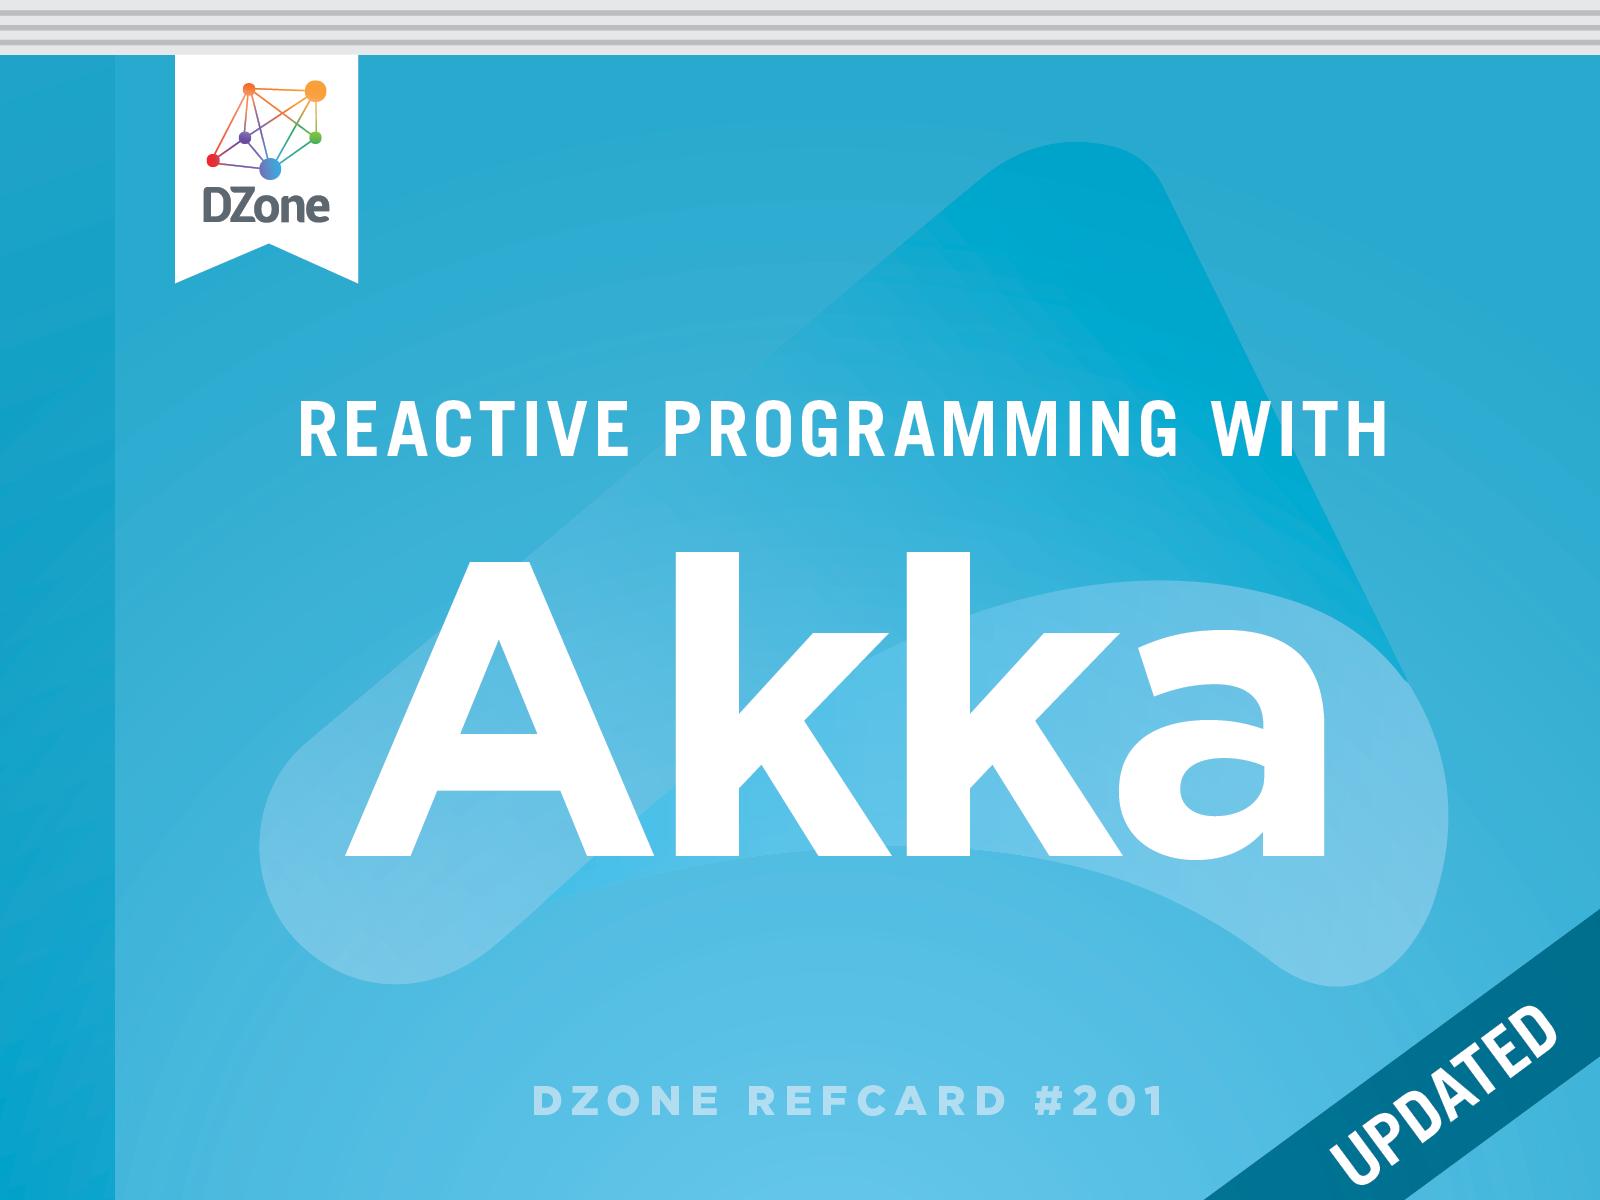 Reactive Programming with Akka - DZone - Refcardz